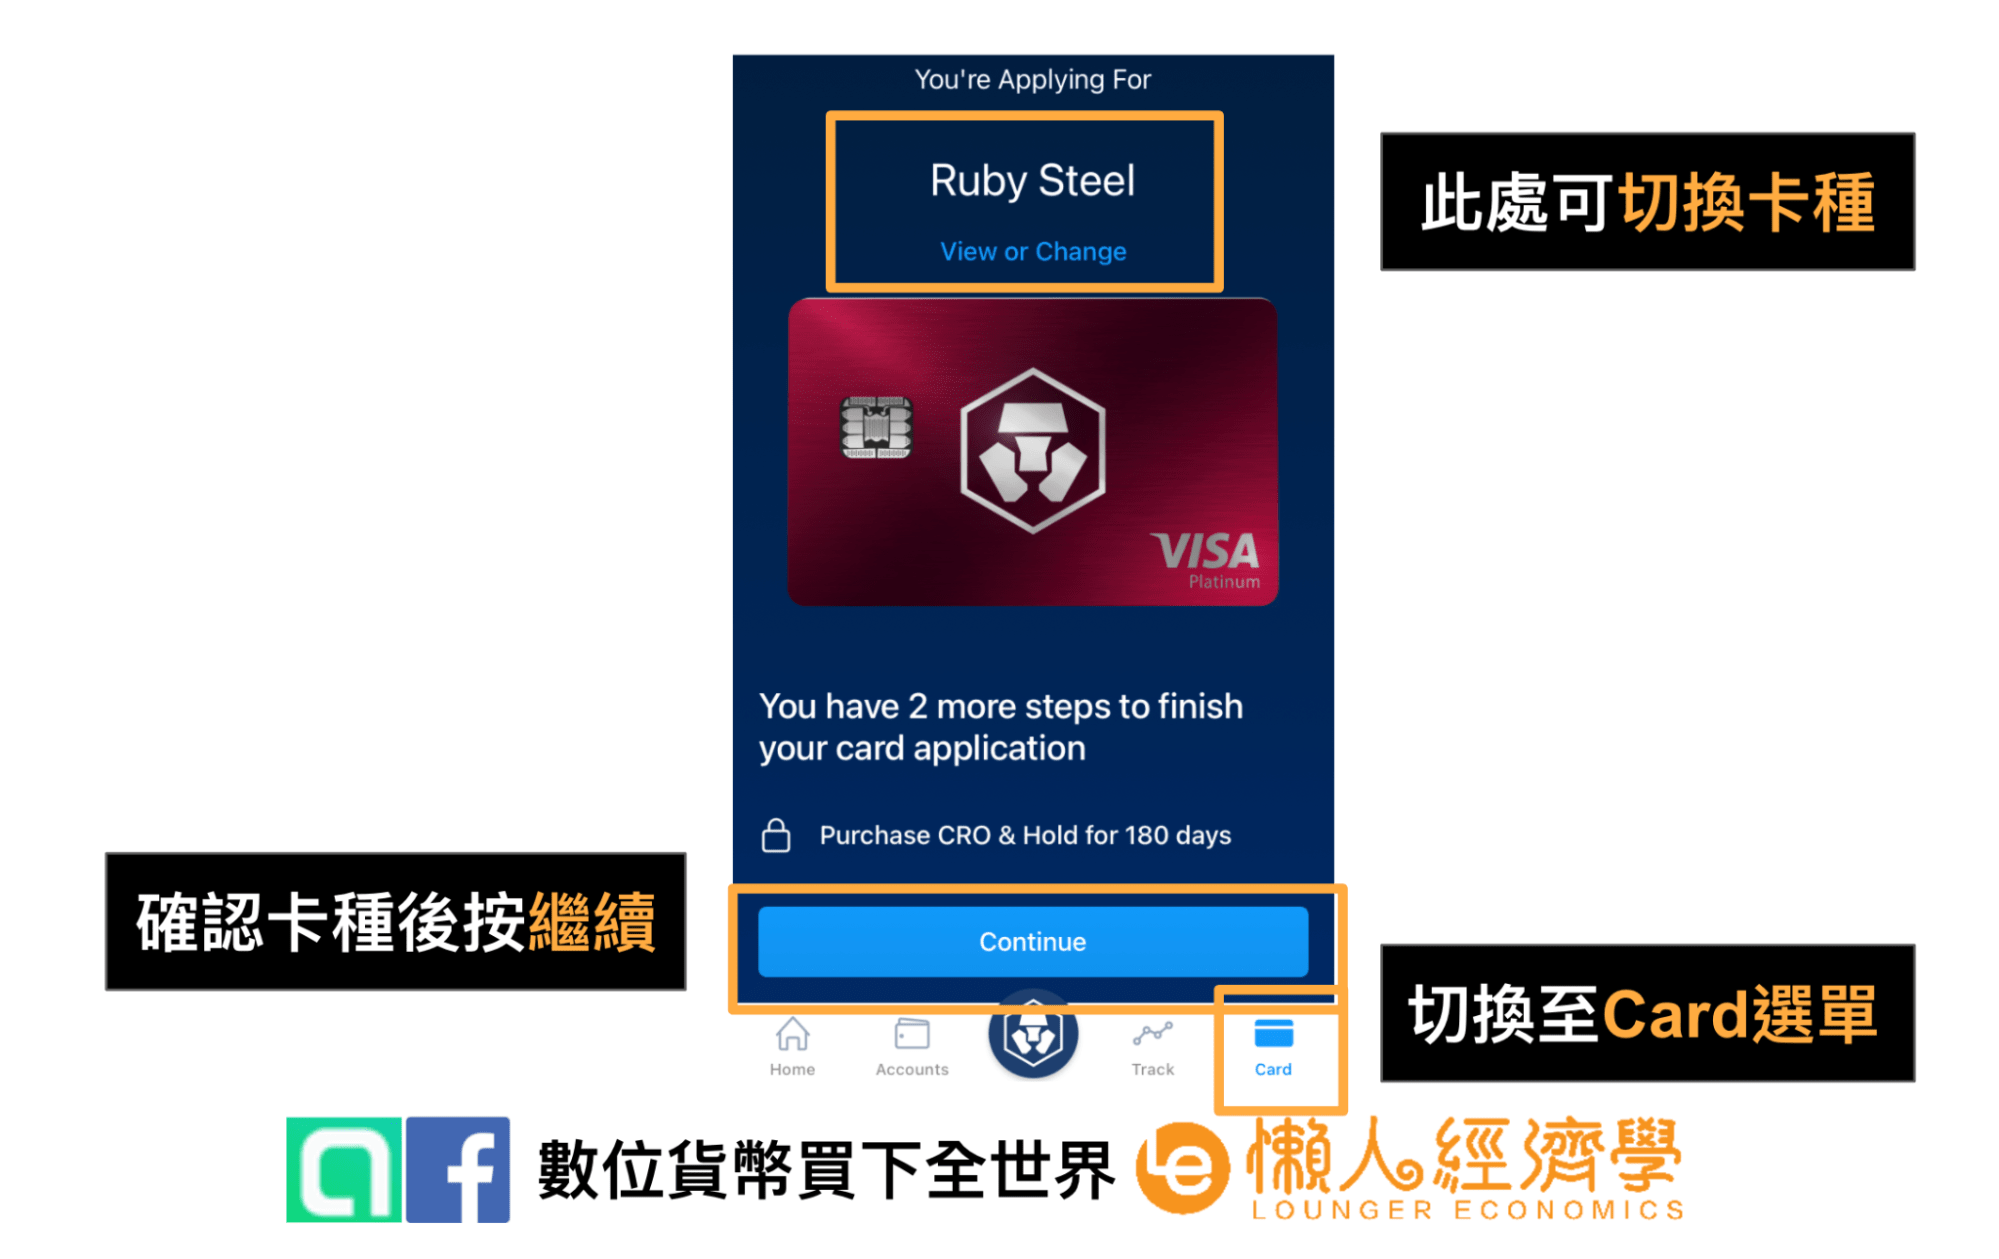 CRO金融卡申辦教學:STEP 2.打開Crypto.com app,切到最右側「Card」選單